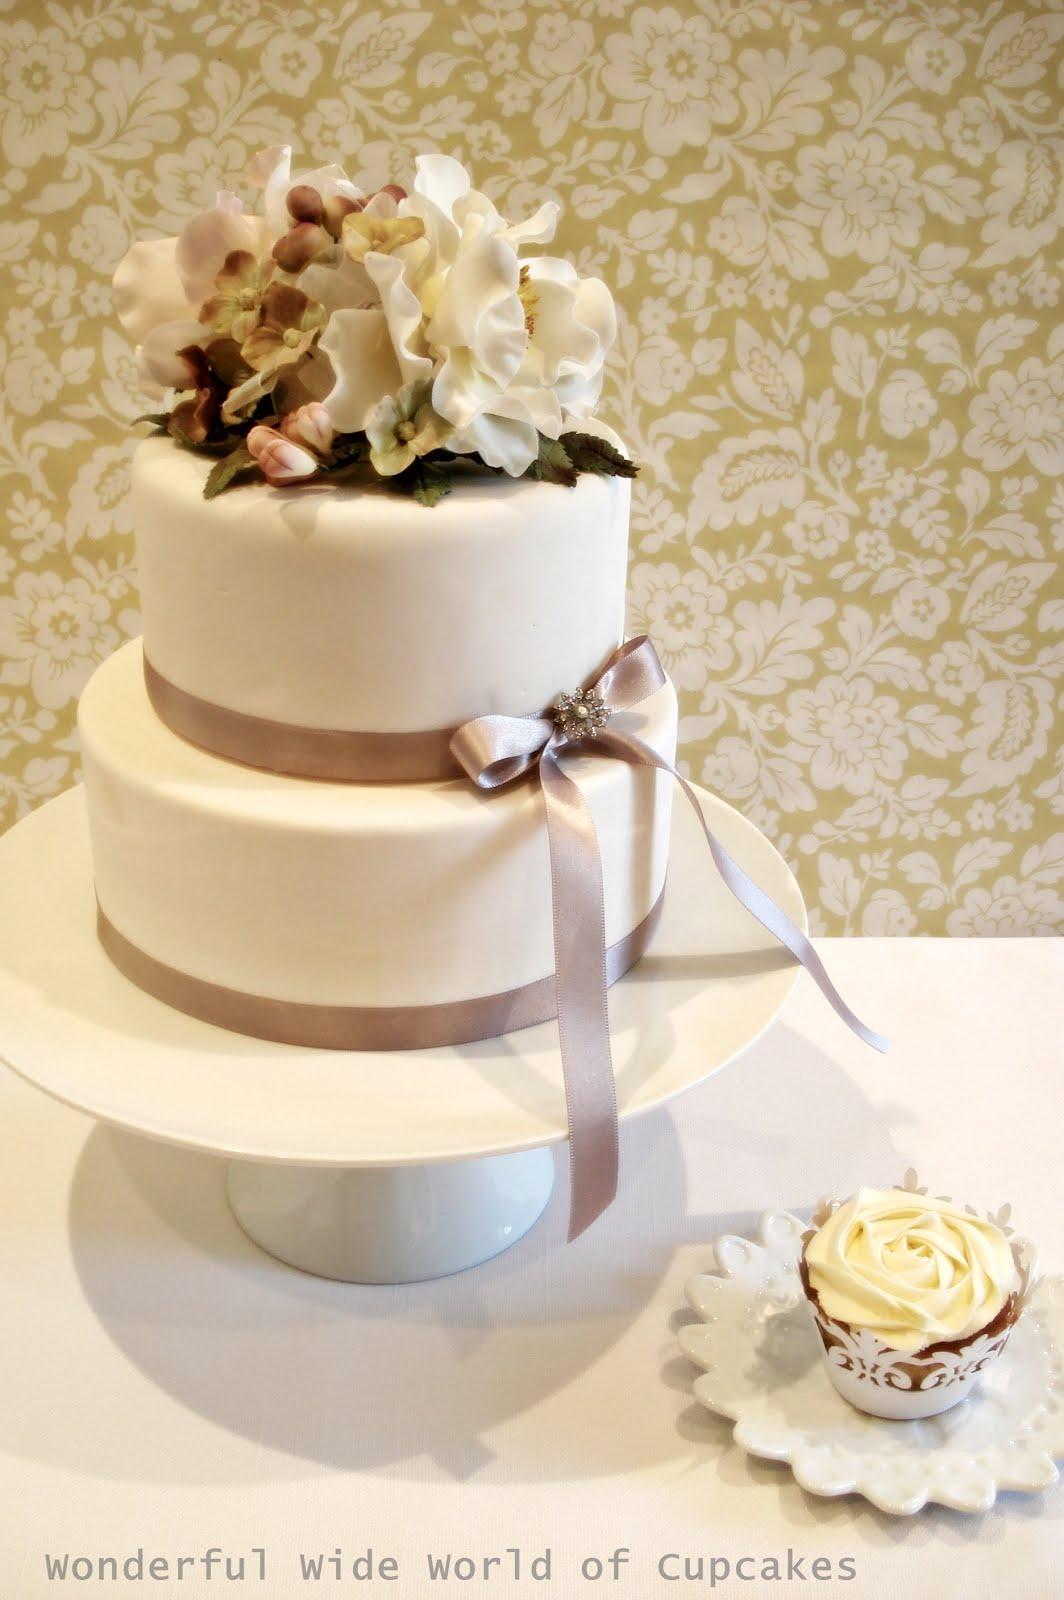 Wonderful World Of Cupcakes Need A Smaller Wedding Cake